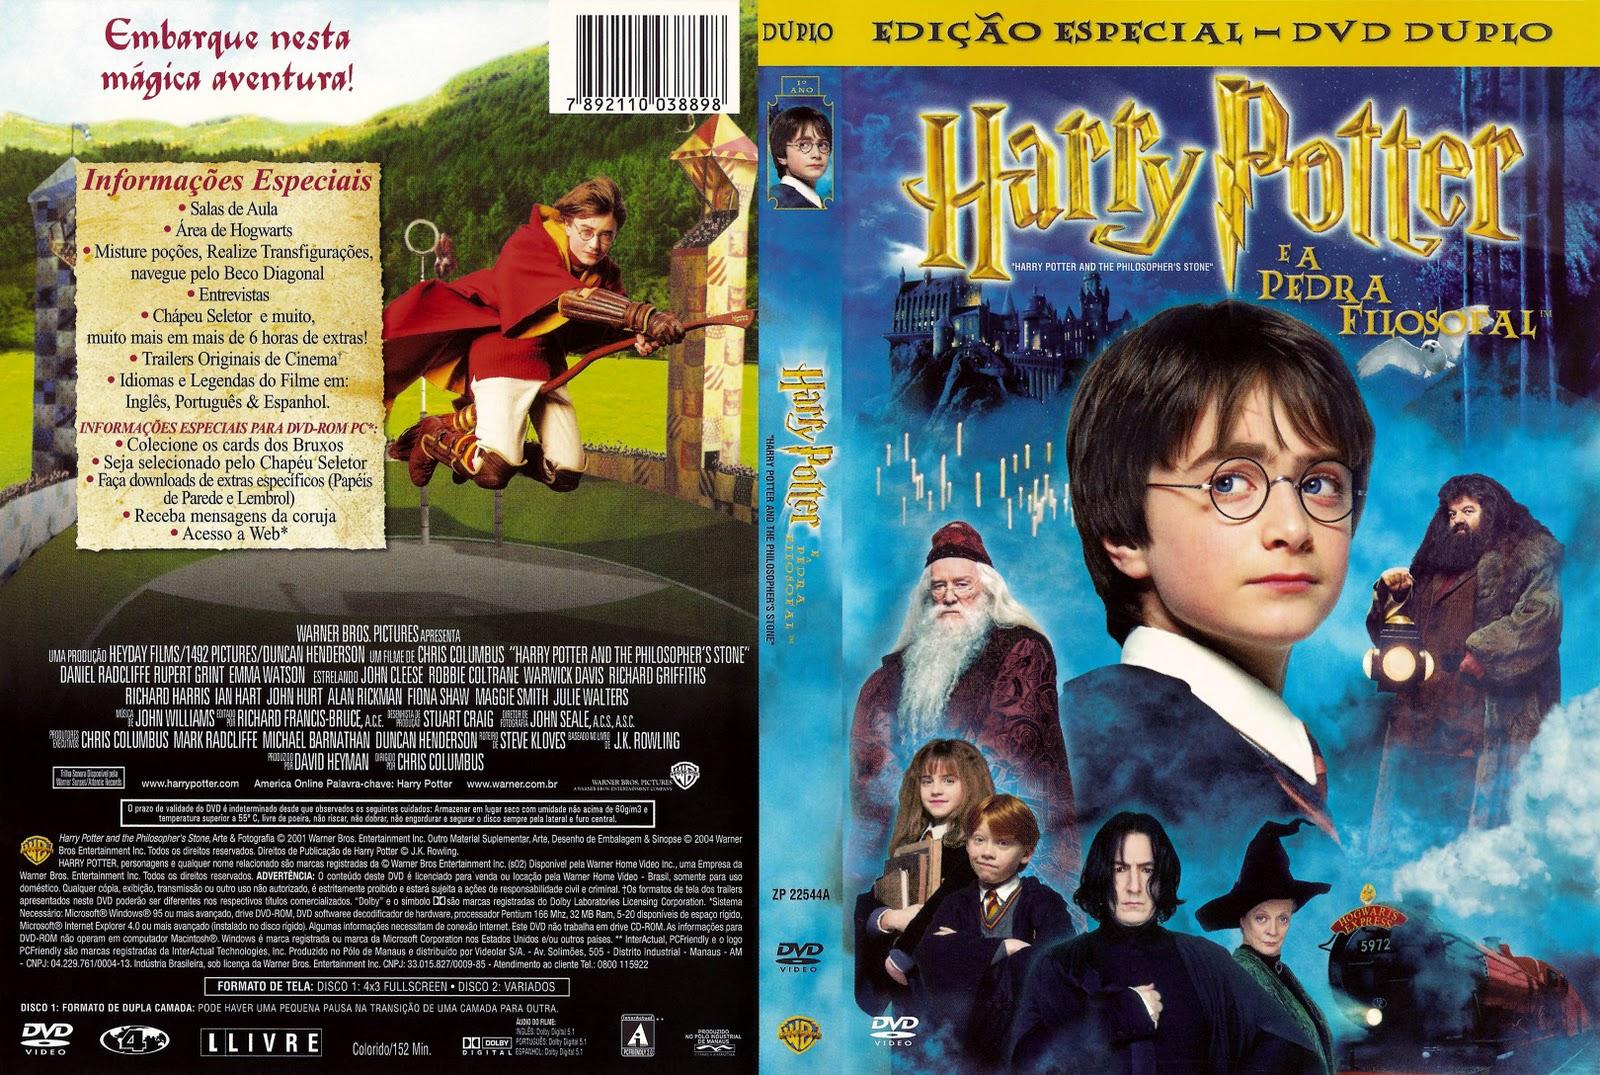 Harry Potter É A Pedra Filosofal throughout capas grÁtis: harry potter e a pedra filosofal